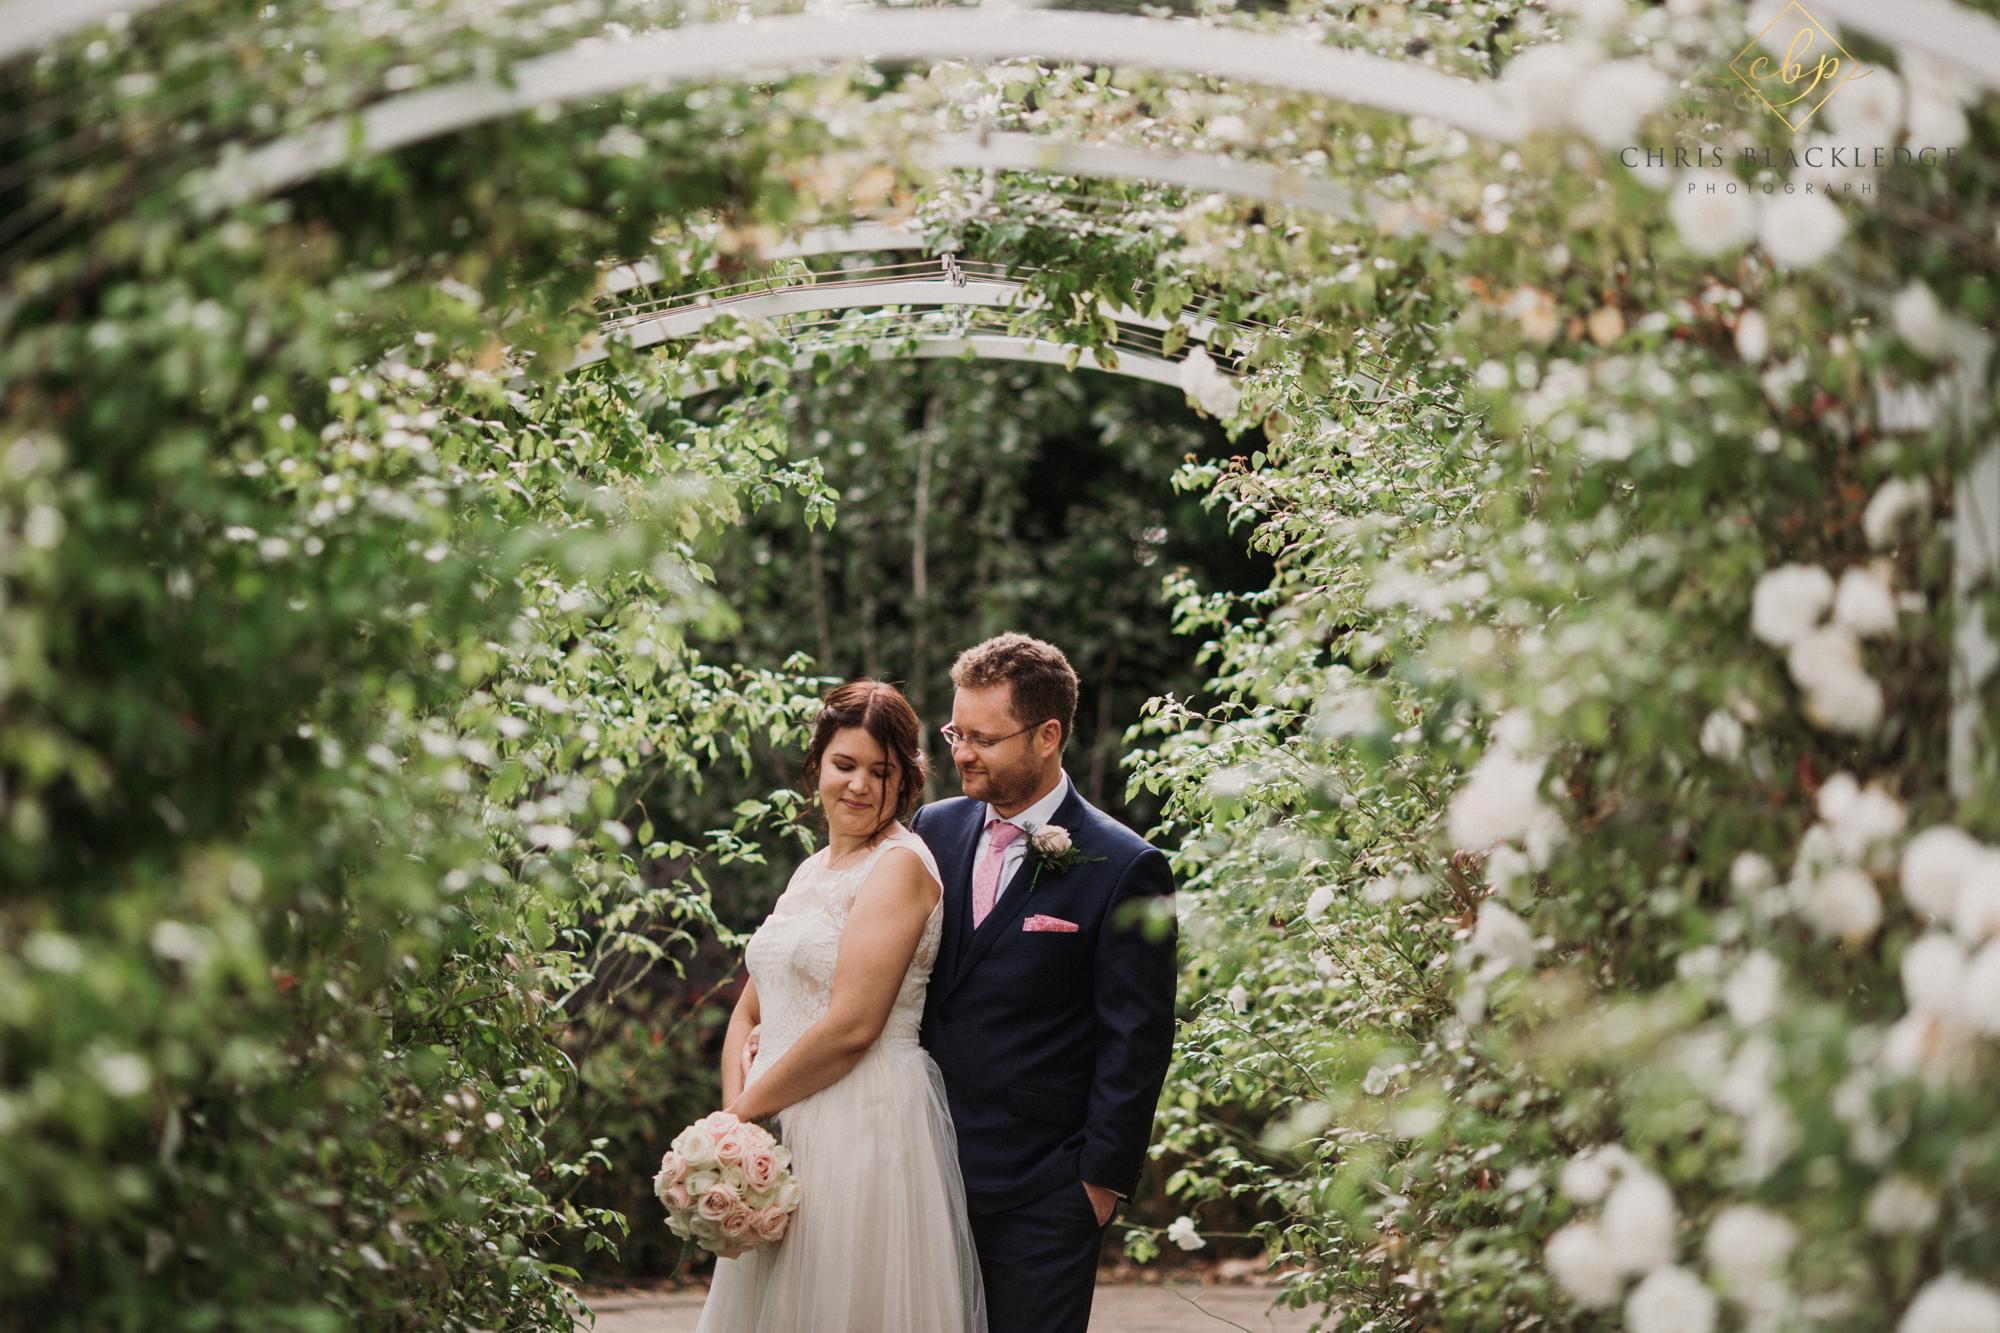 ferry_house_inn_wedding_photographer97.jpg